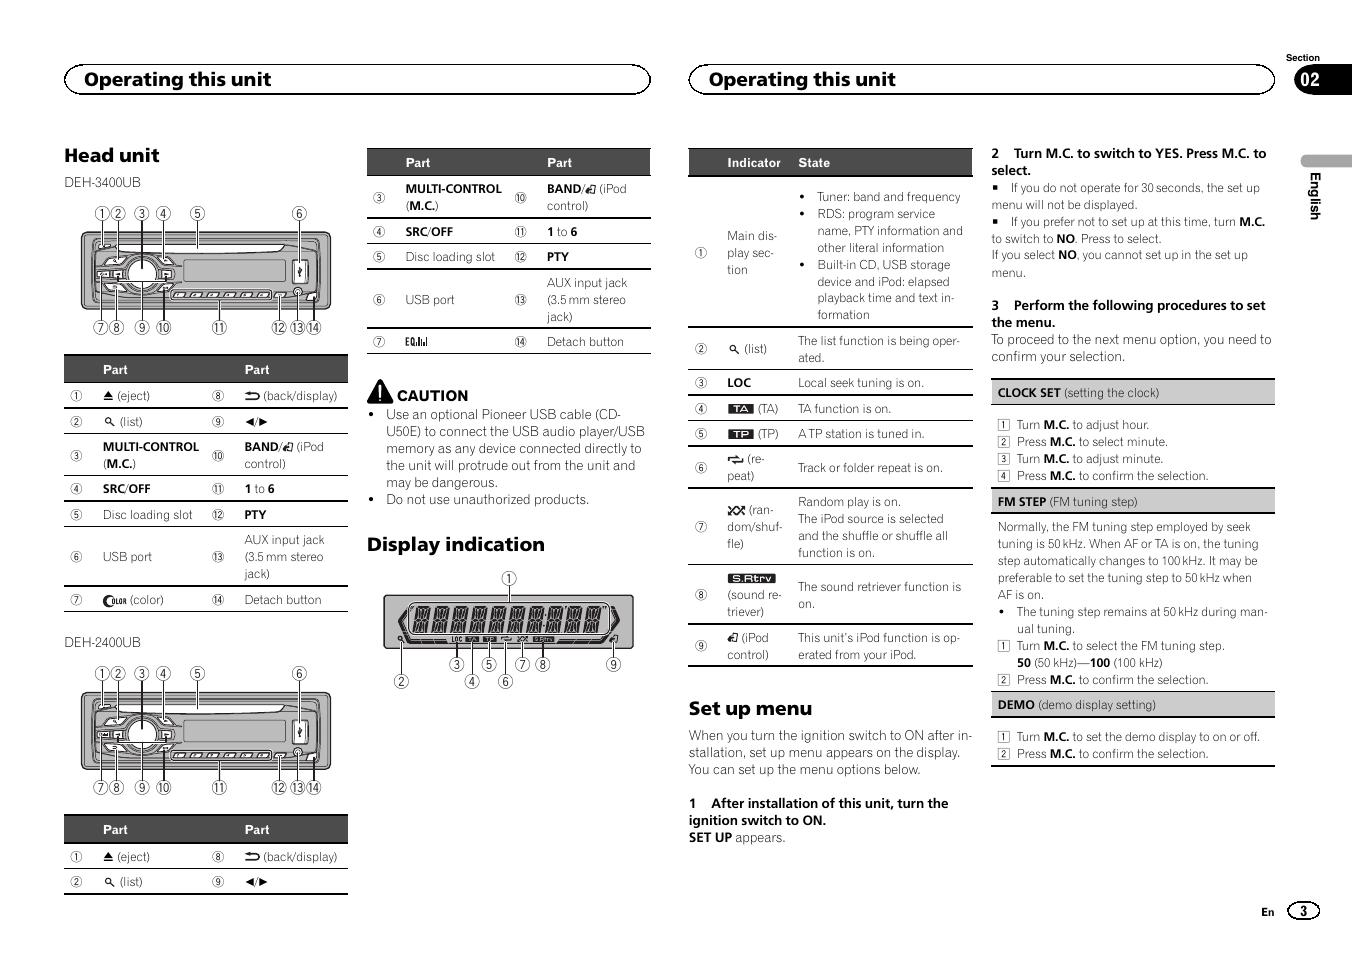 Head unit, Display indication, Set up menu | Operating this unit | Pioneer  DEH